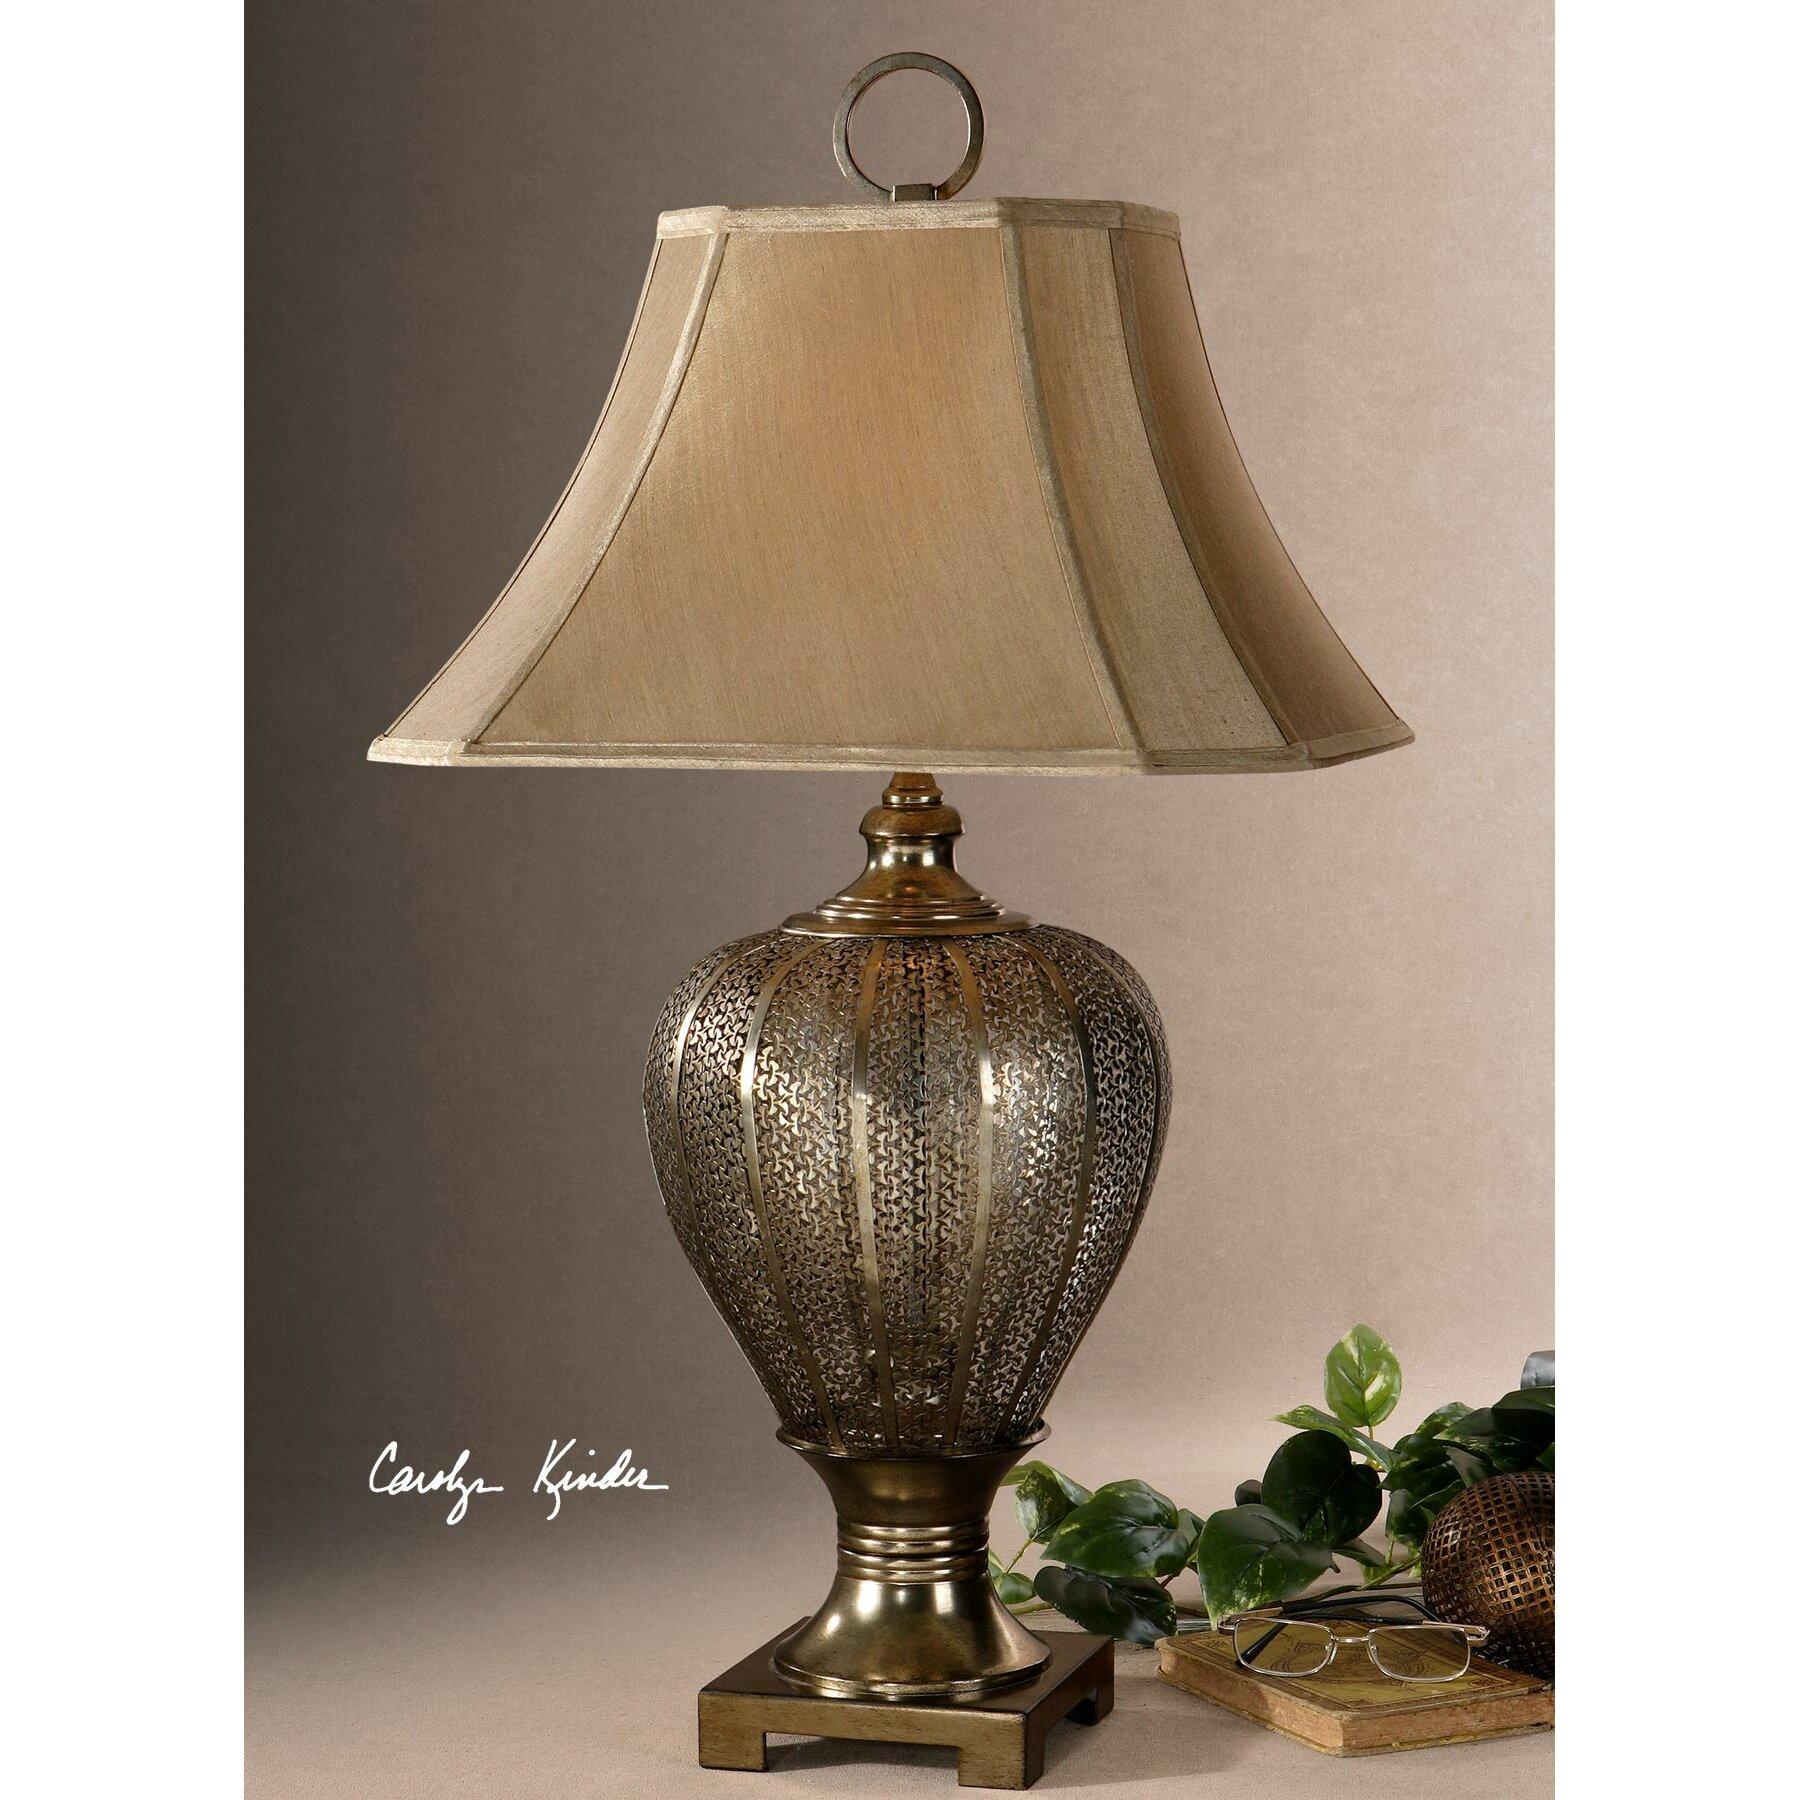 uttermost cupello 33 table lamp reviews wayfair. Black Bedroom Furniture Sets. Home Design Ideas